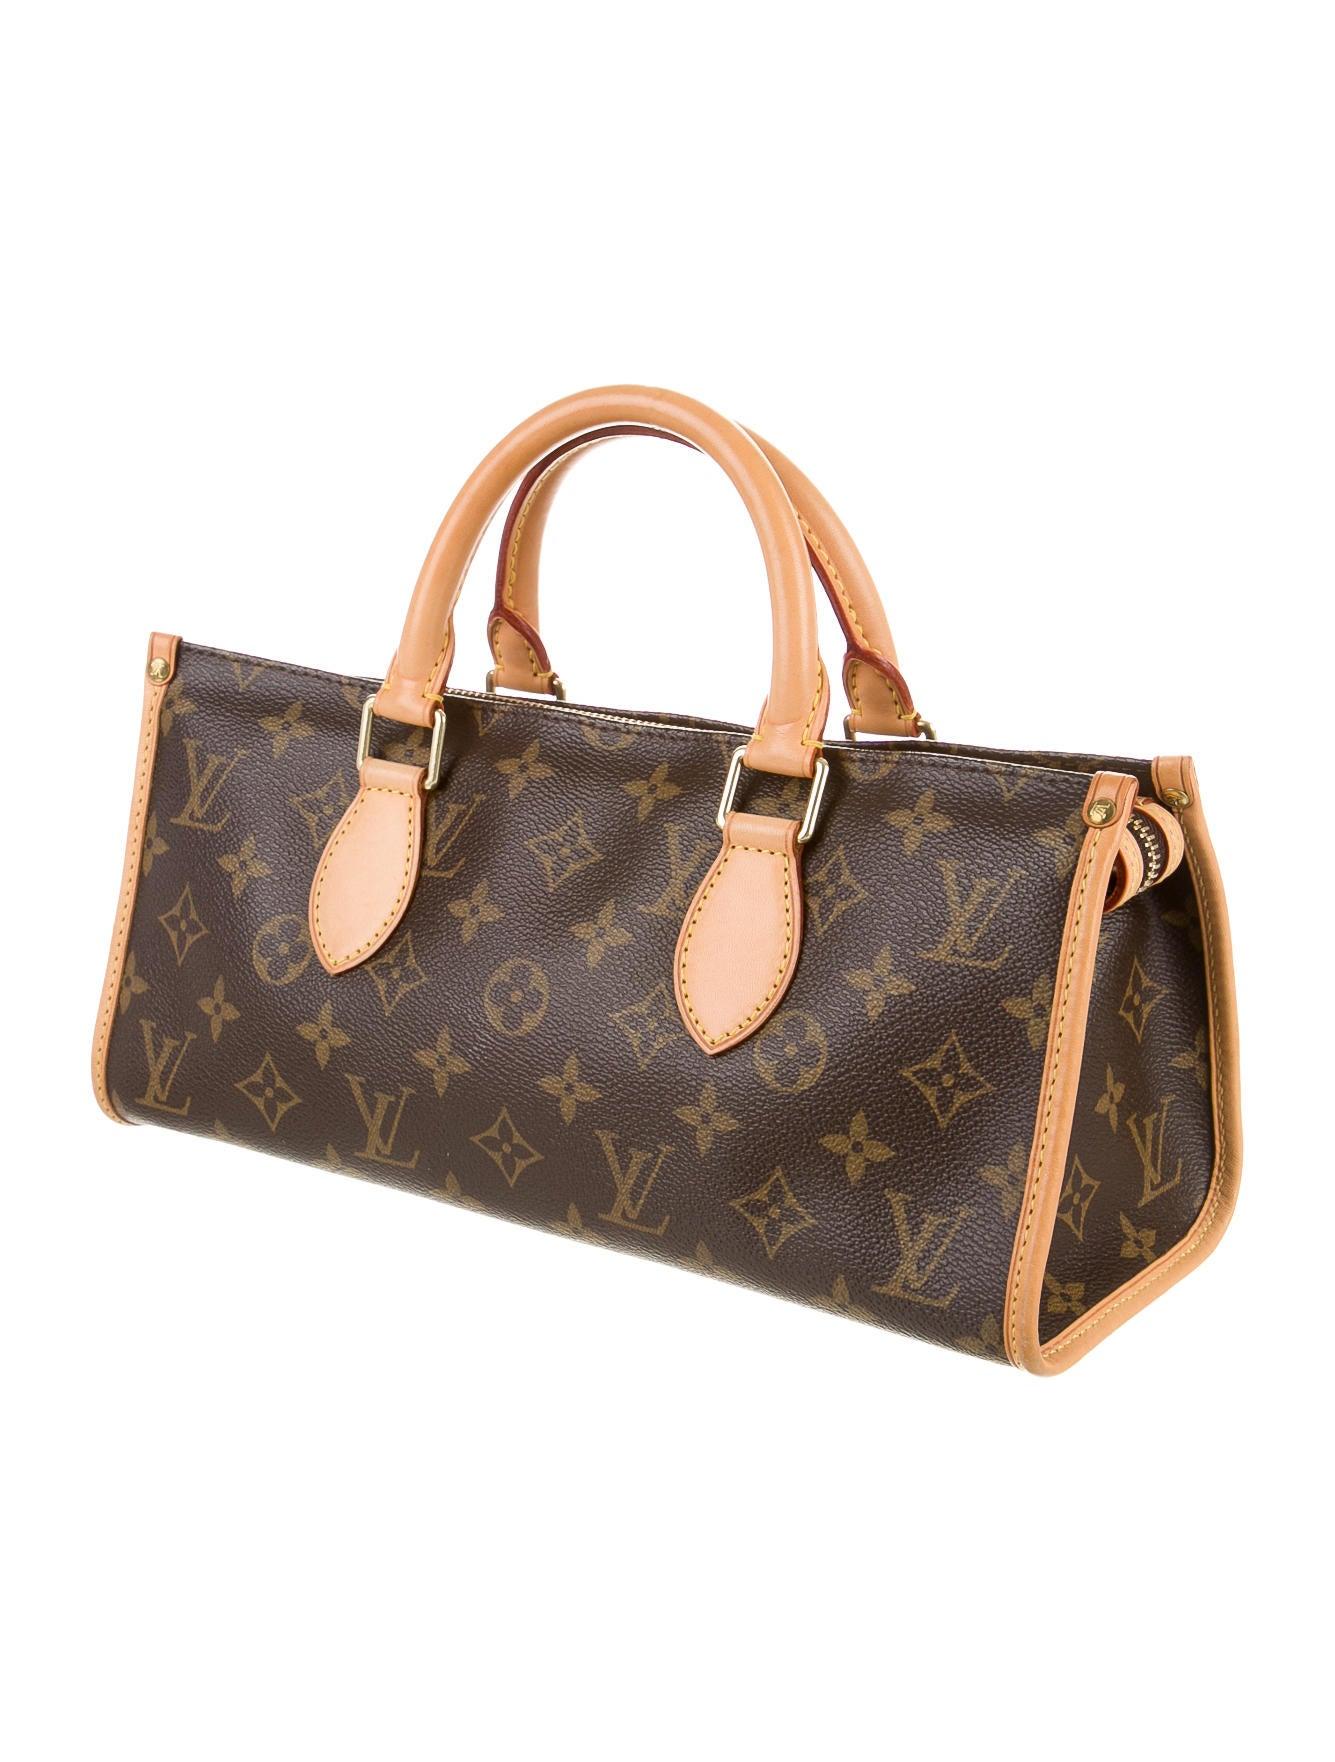 Louis vuitton monogram popincourt bag handbags for Louis vuitton miroir bags